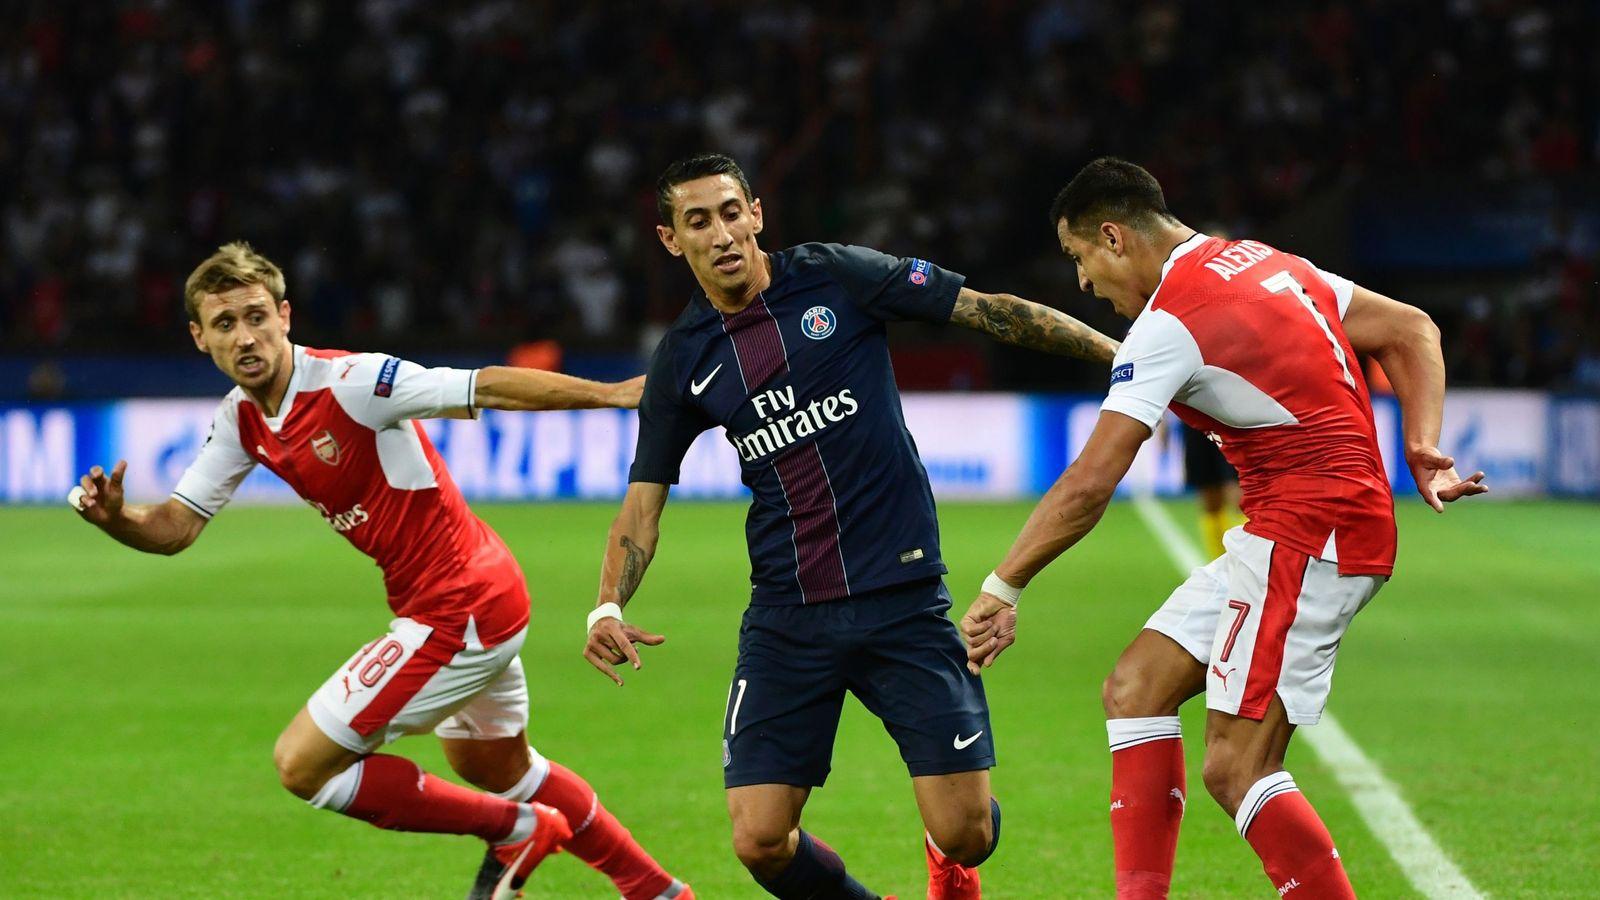 Match Preview - Arsenal vs PSG | 23 Nov 2016